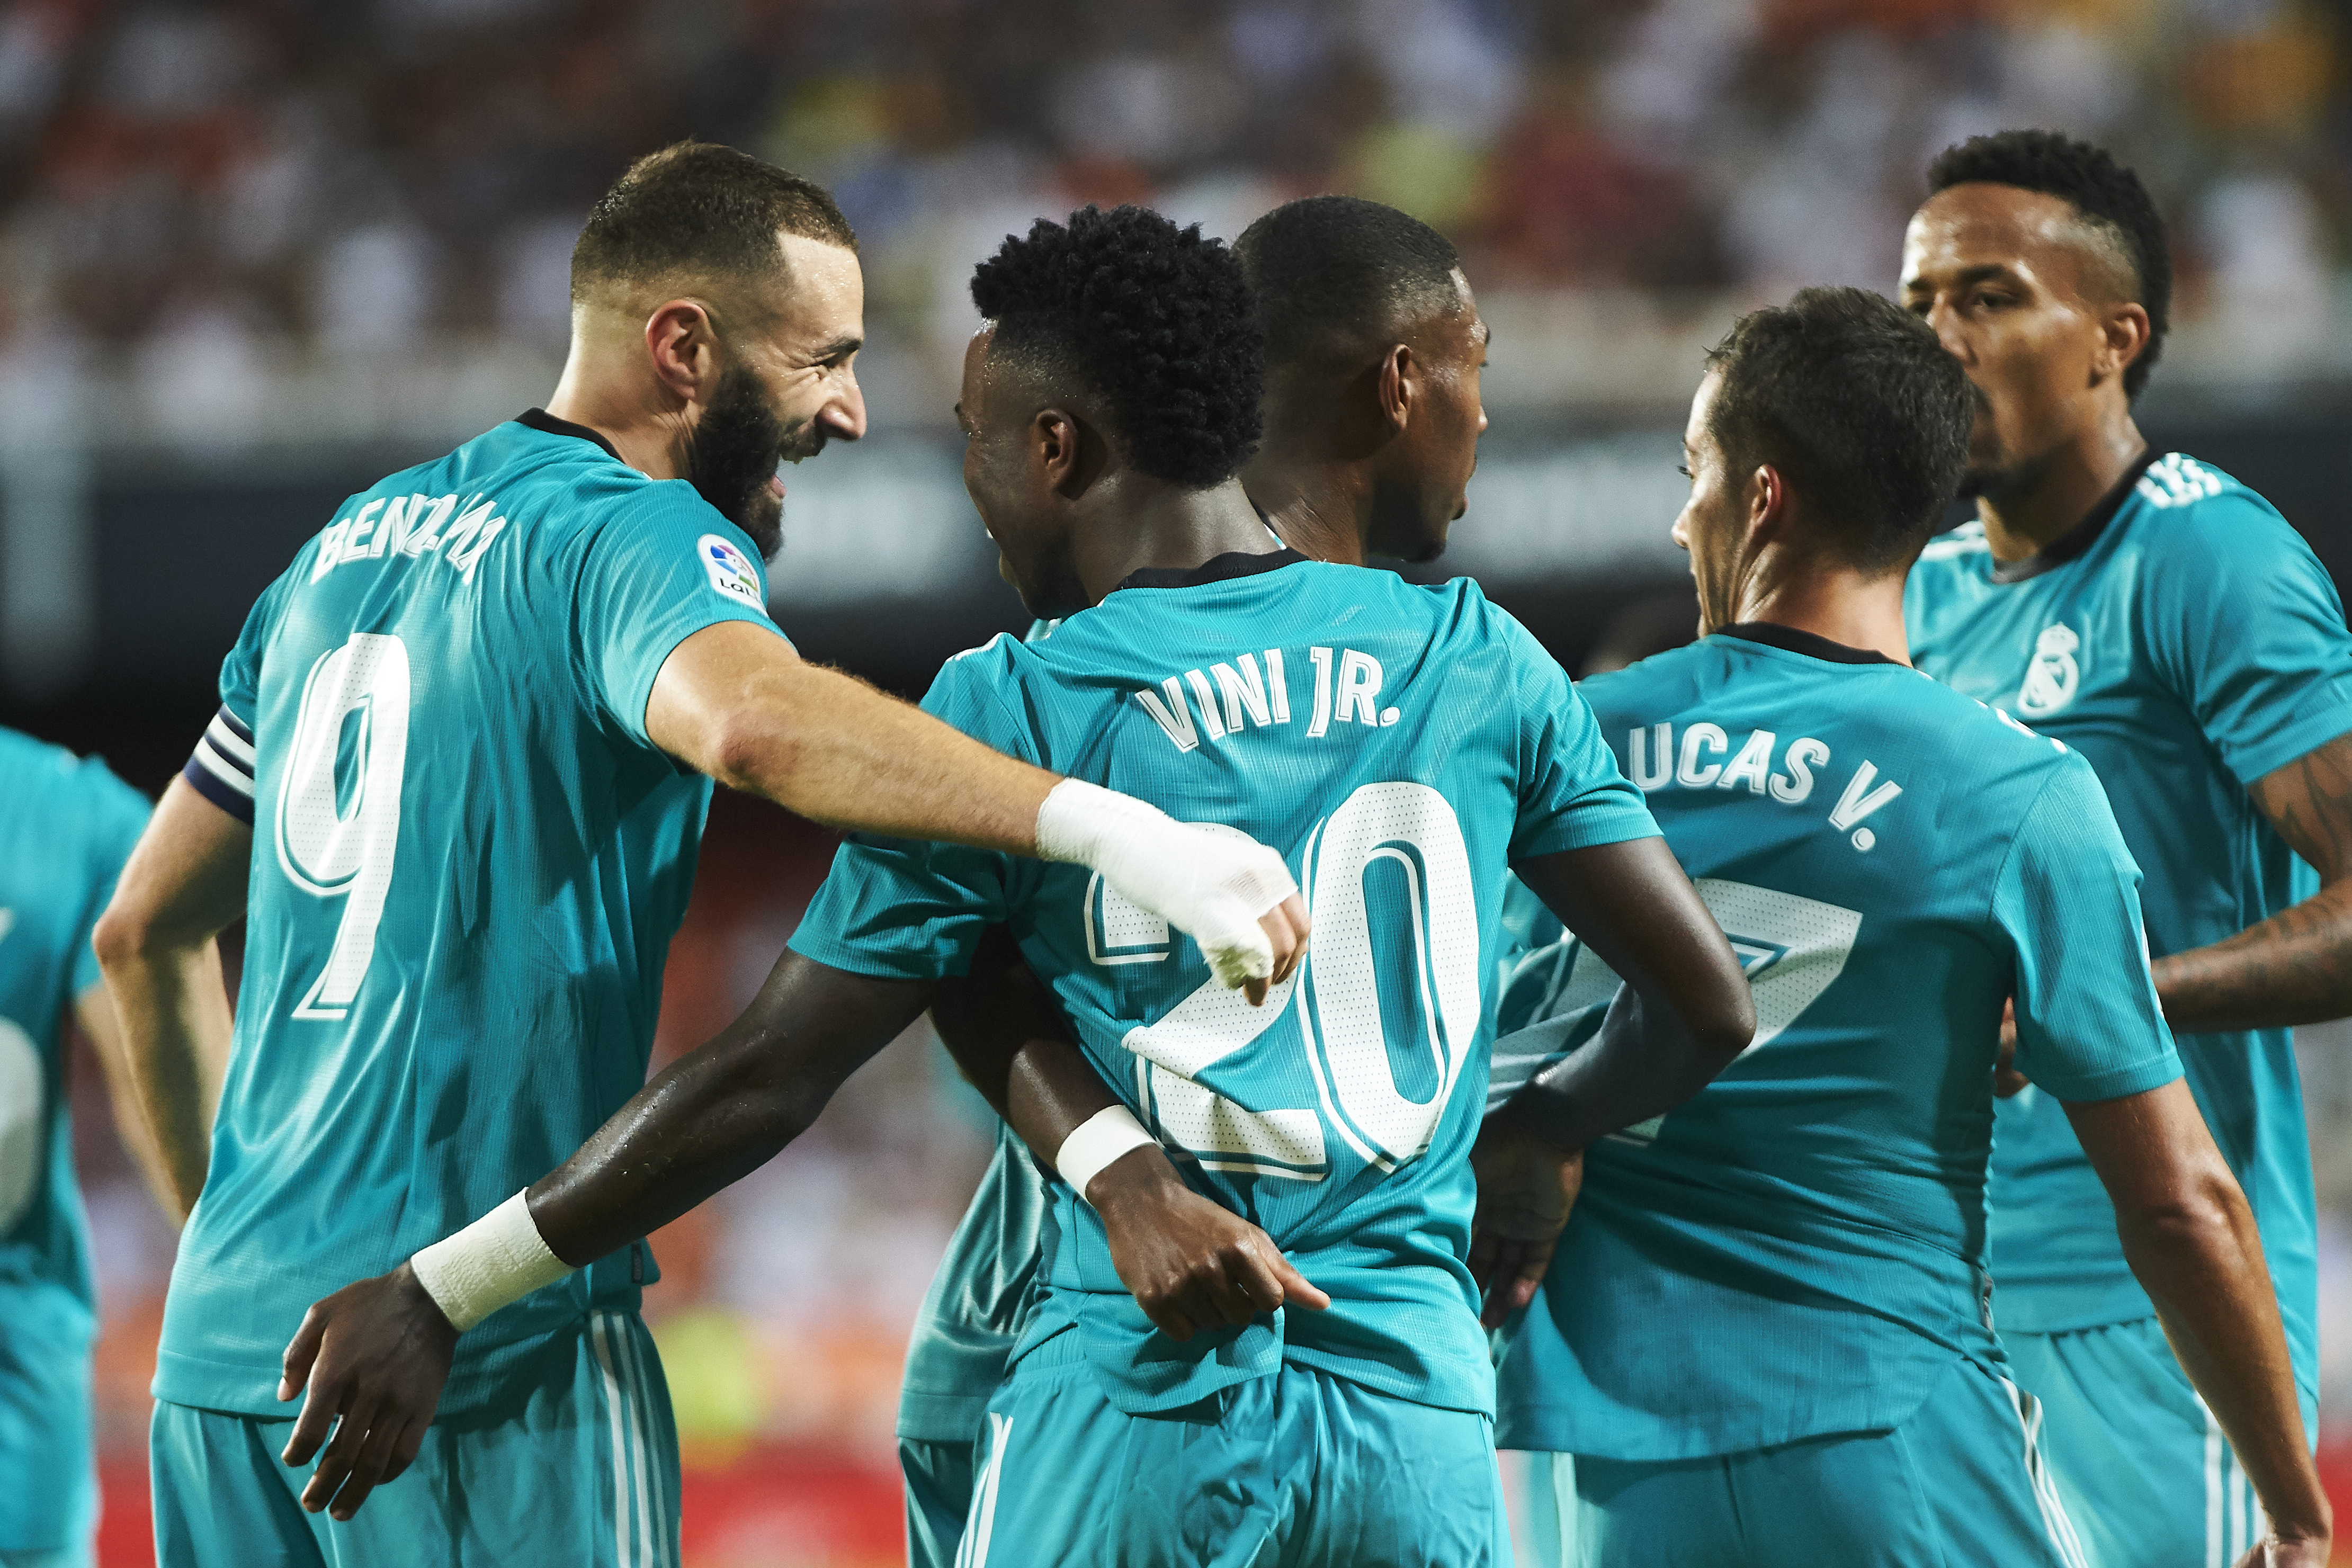 Valencia CF v Real Madrid CF - LaLiga Santander